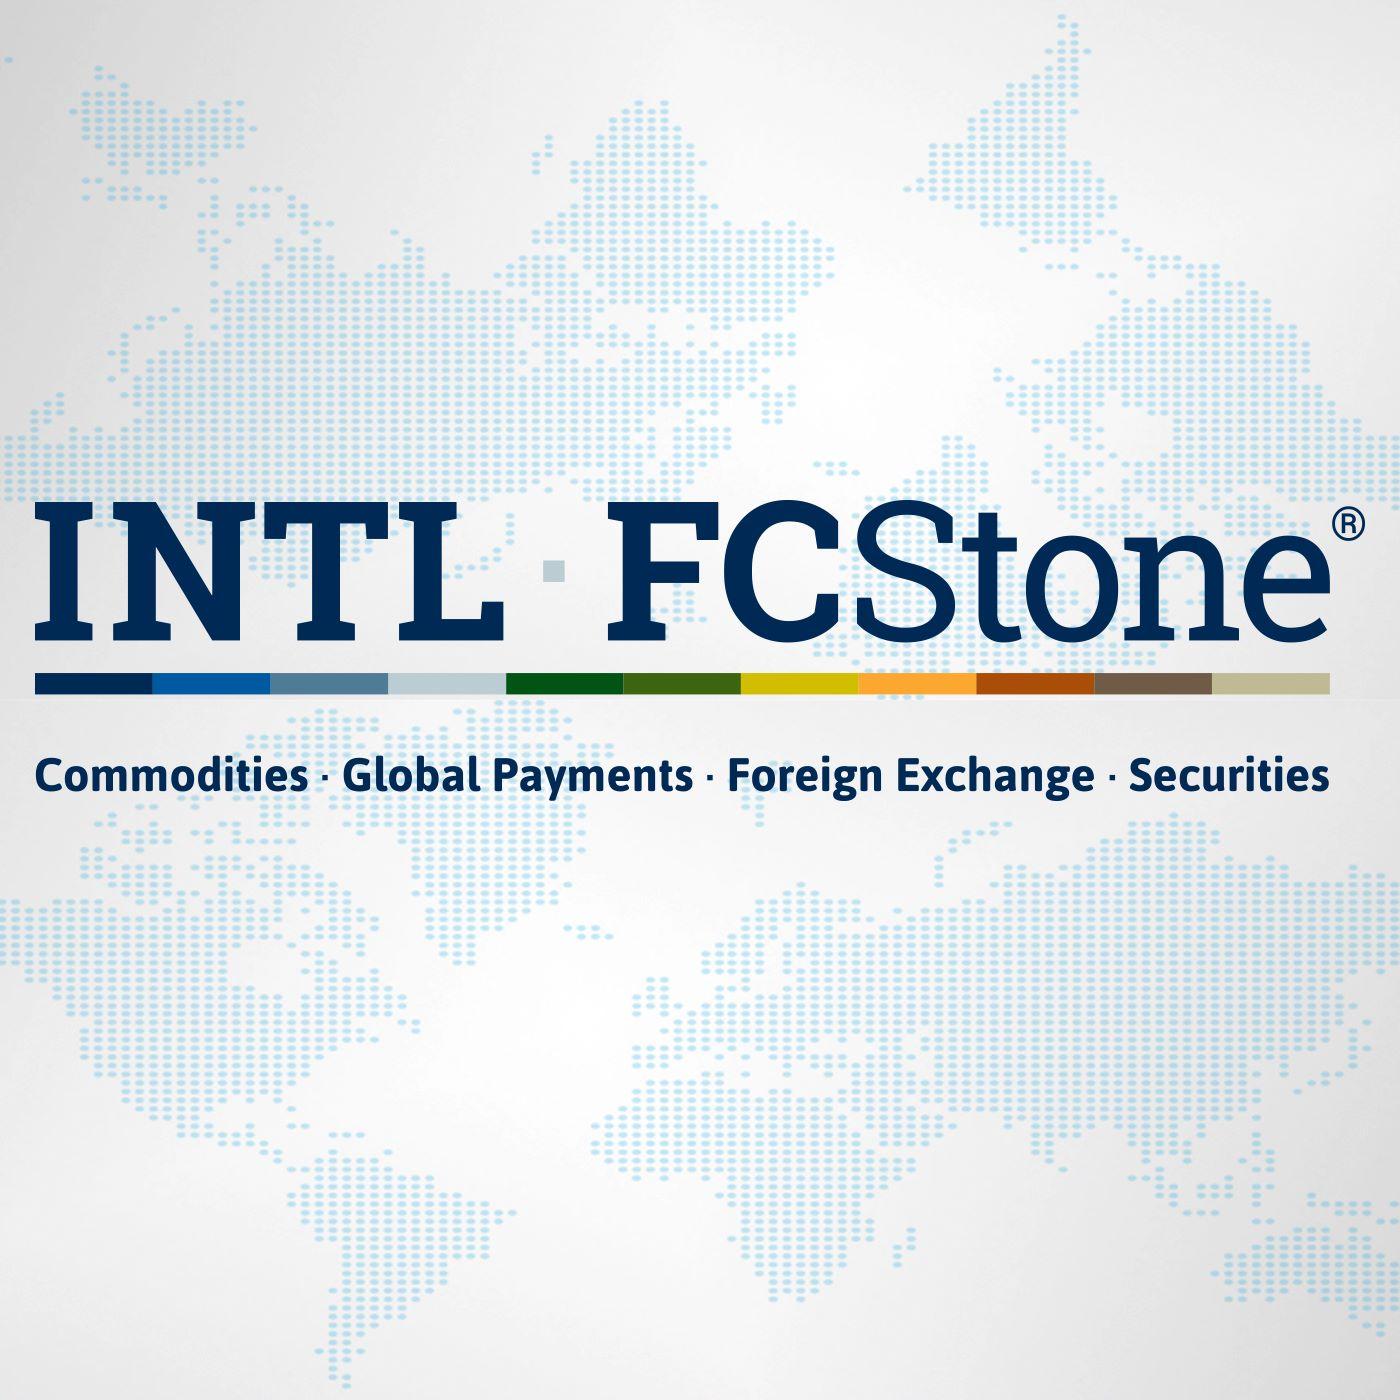 INTL FCStone - Home